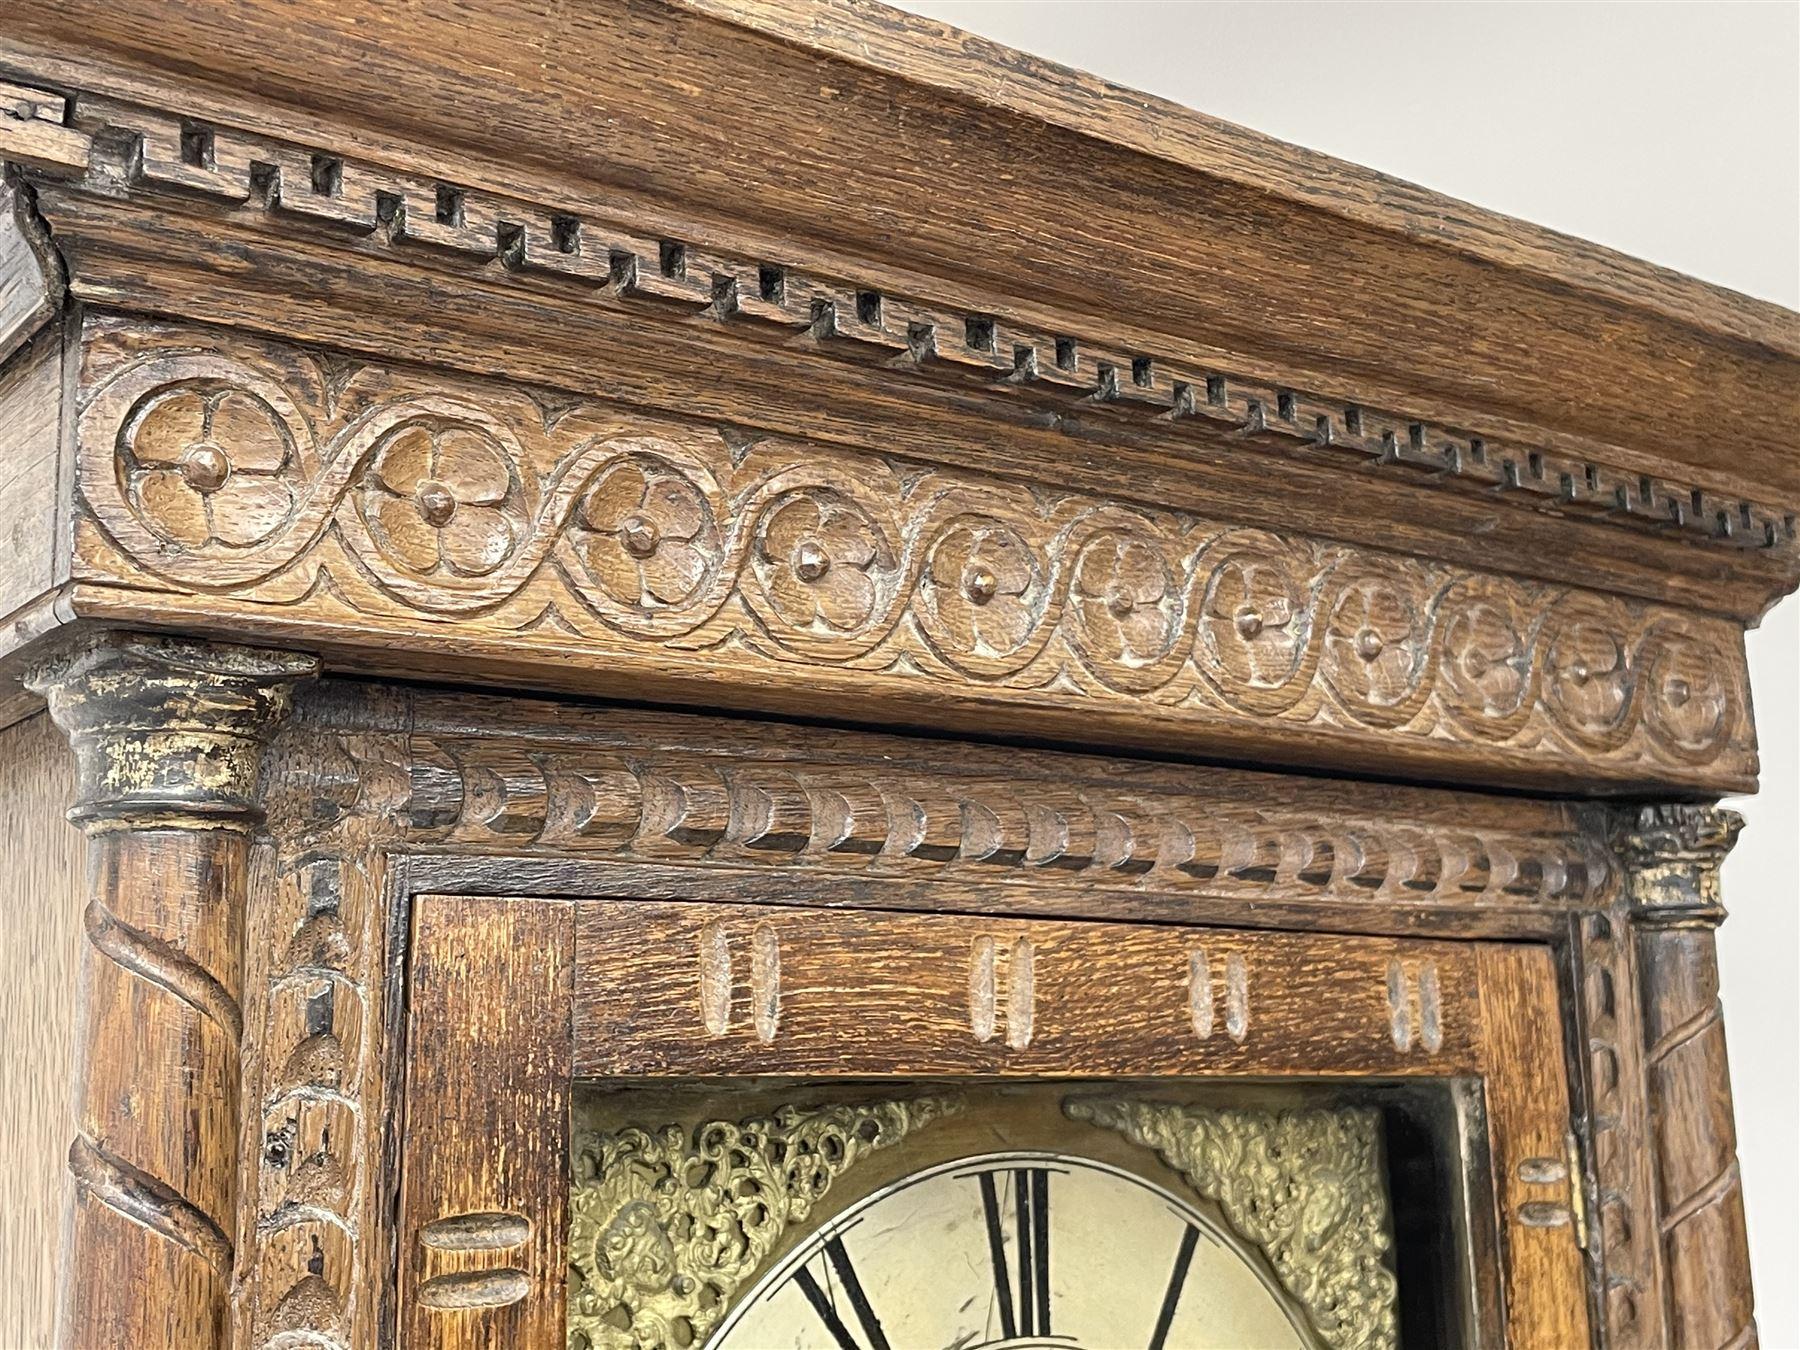 19th century carved oak longcase clock - Image 6 of 10